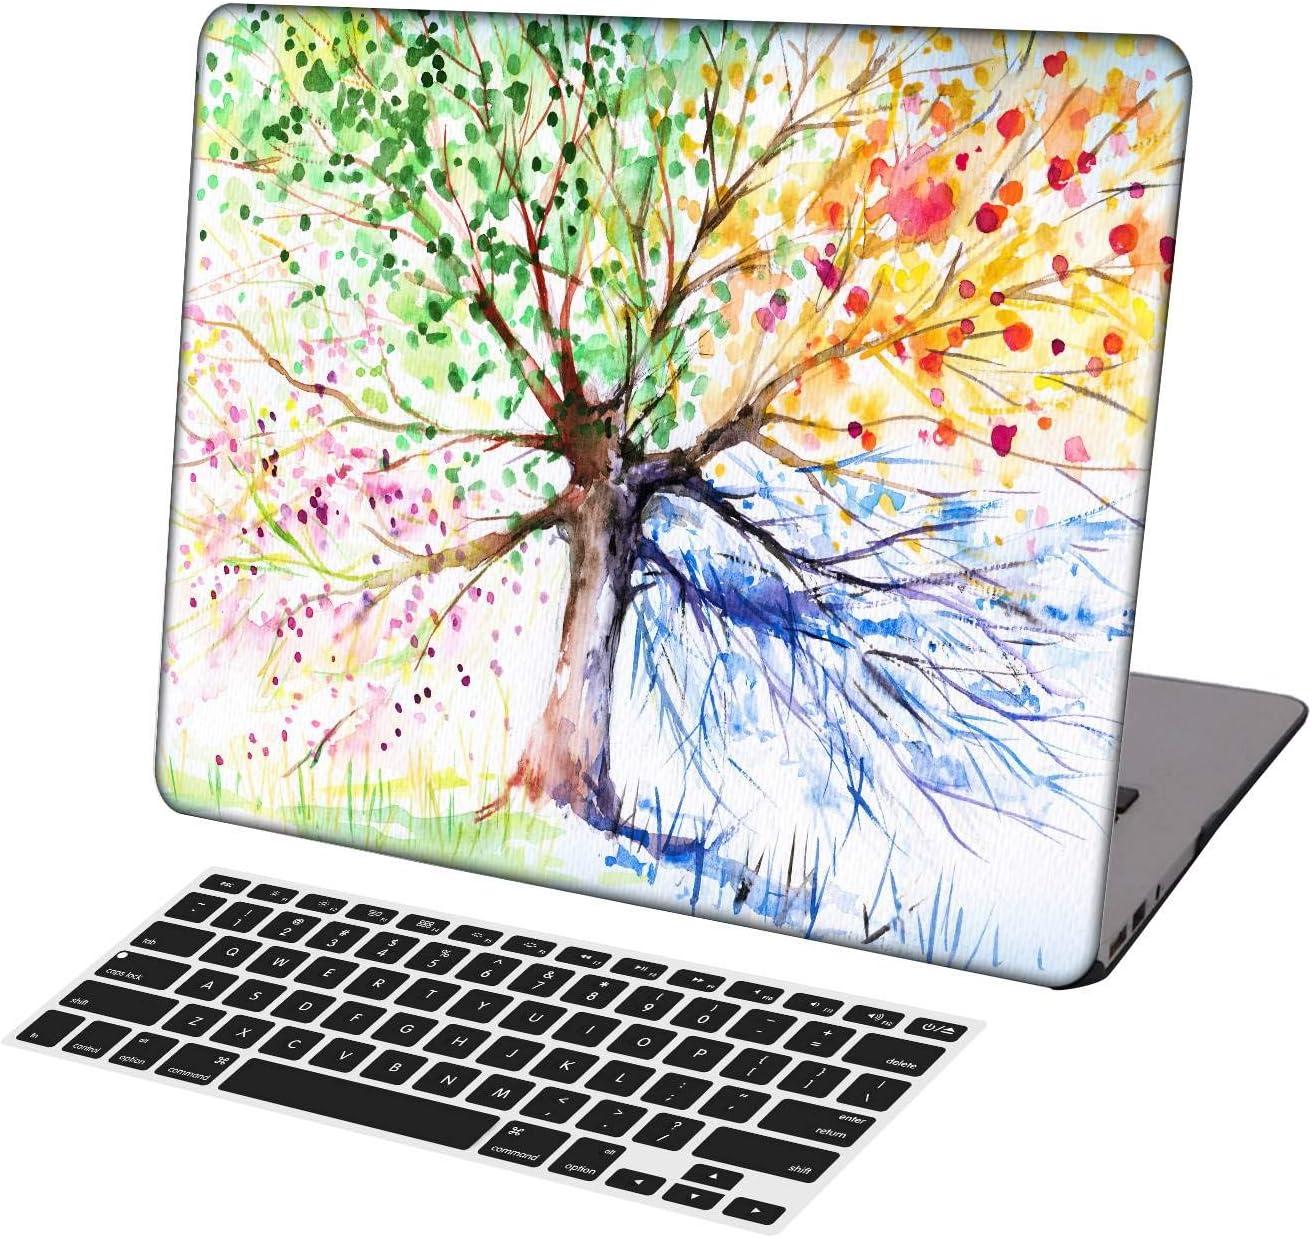 KSK KAISHEK Laptop Case for Older MacBook Pro 15 inch(2012-2015 Release,Retina Display,No DVD ROM/Touch Bar) Model A1398,Ultra Slim Light Hard Shell Keyboard Cover,Color Tree